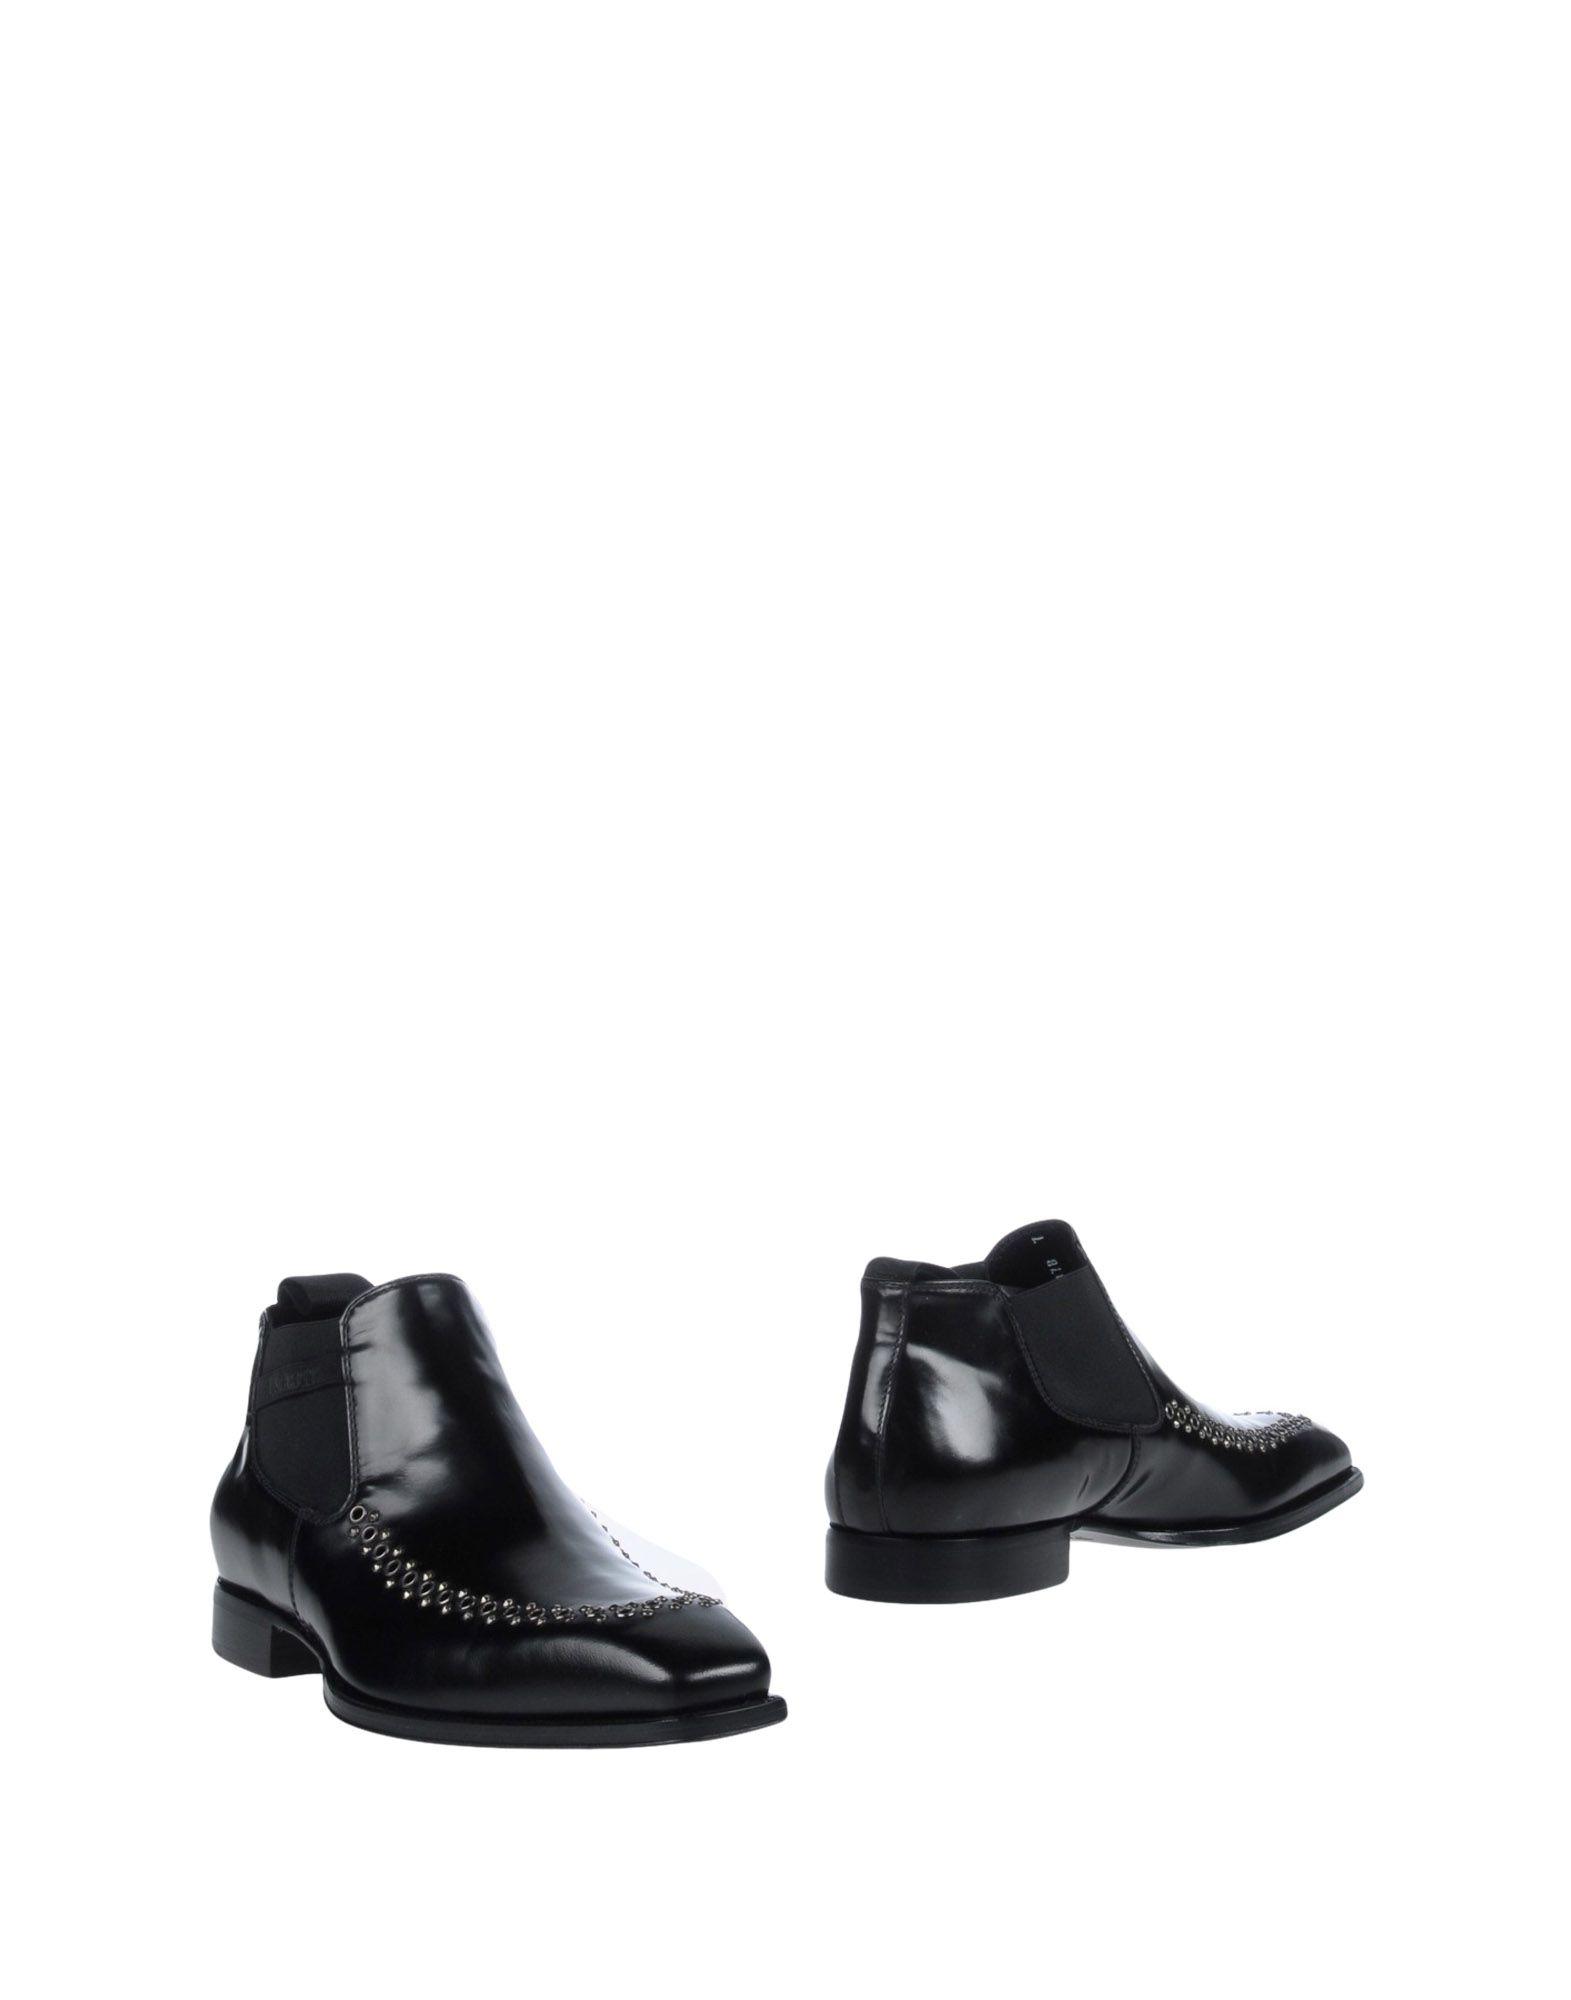 Cesare Paciotti Stiefelette Qualität Herren  11506750XV Gute Qualität Stiefelette beliebte Schuhe 1dc688